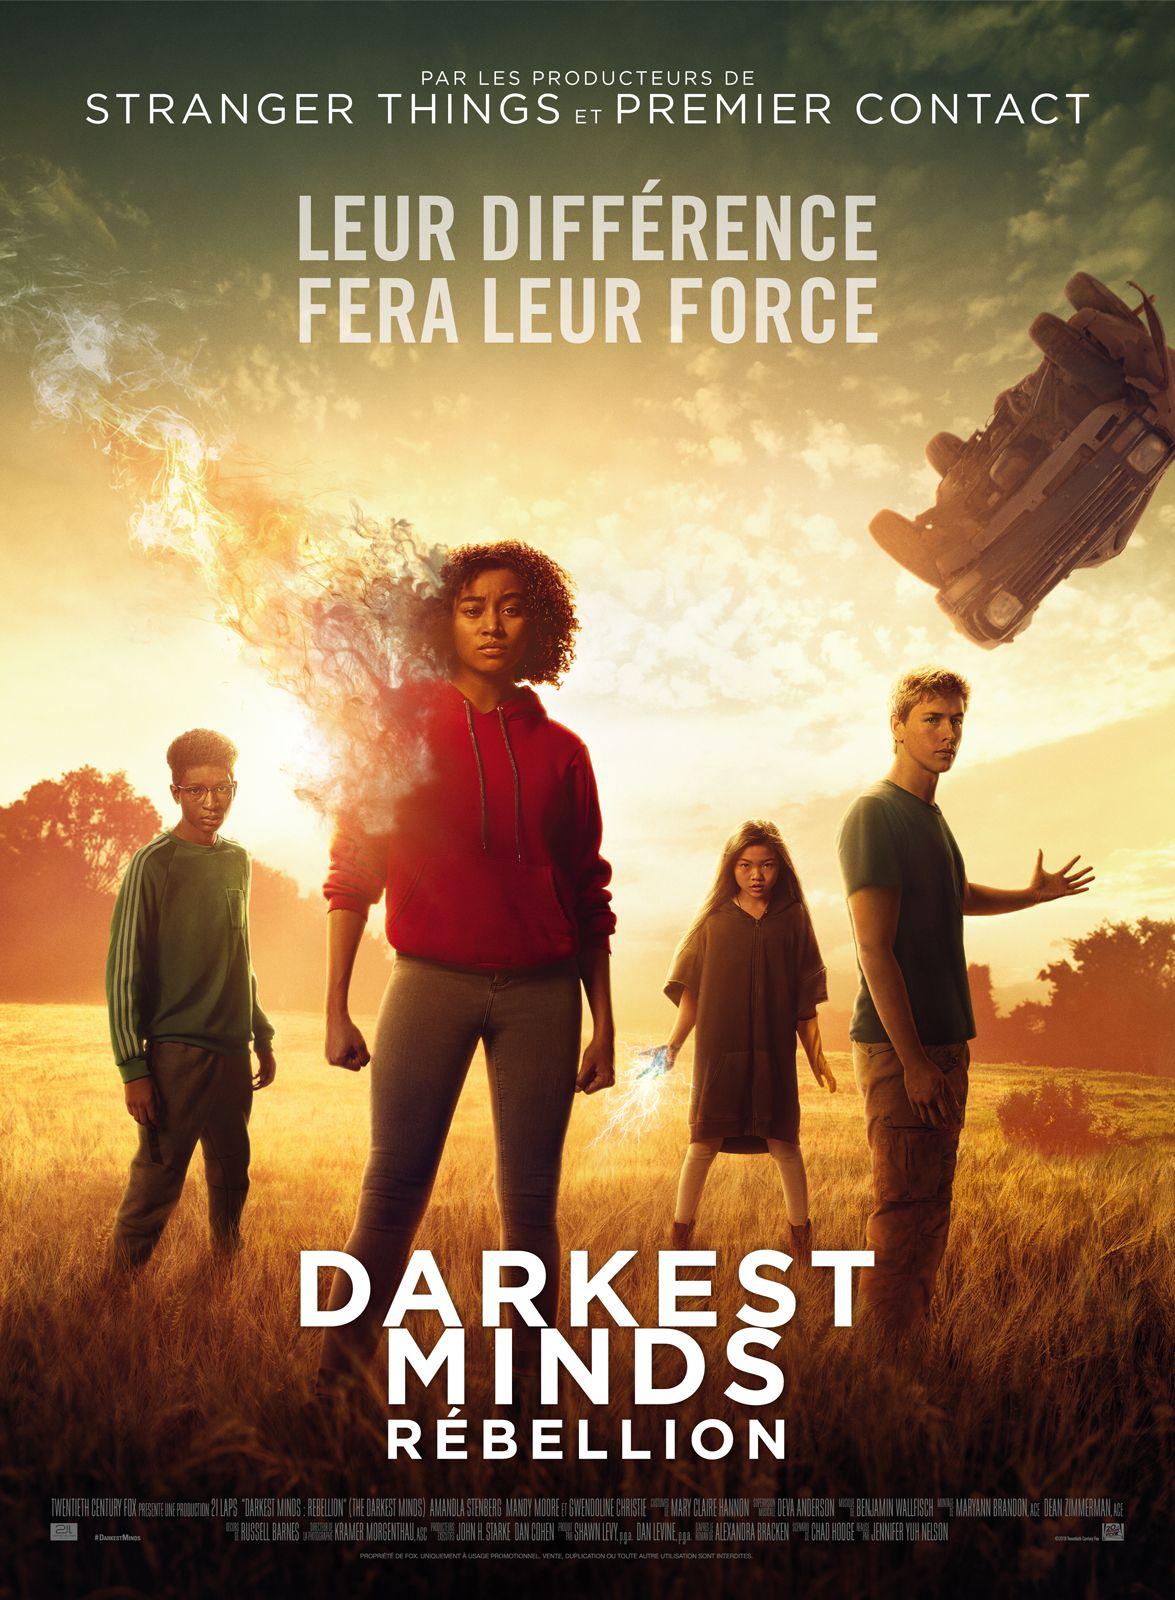 The Darkest Minds: Rébellion : darkest, minds:, rébellion, Darkest, Minds, Rébellion, (2018), SensCritique